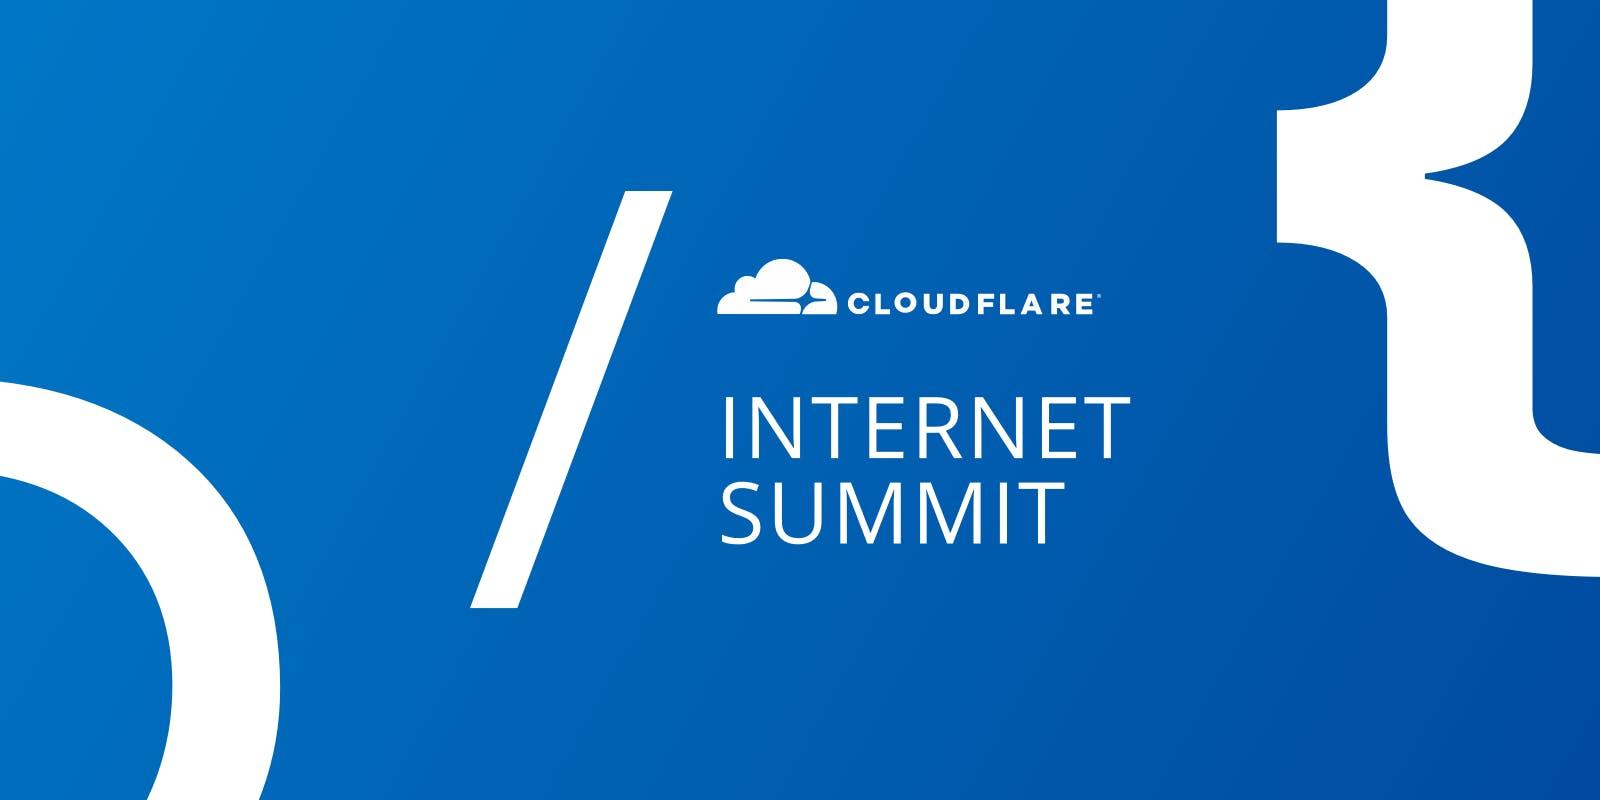 London Cloudflare Internet Summit